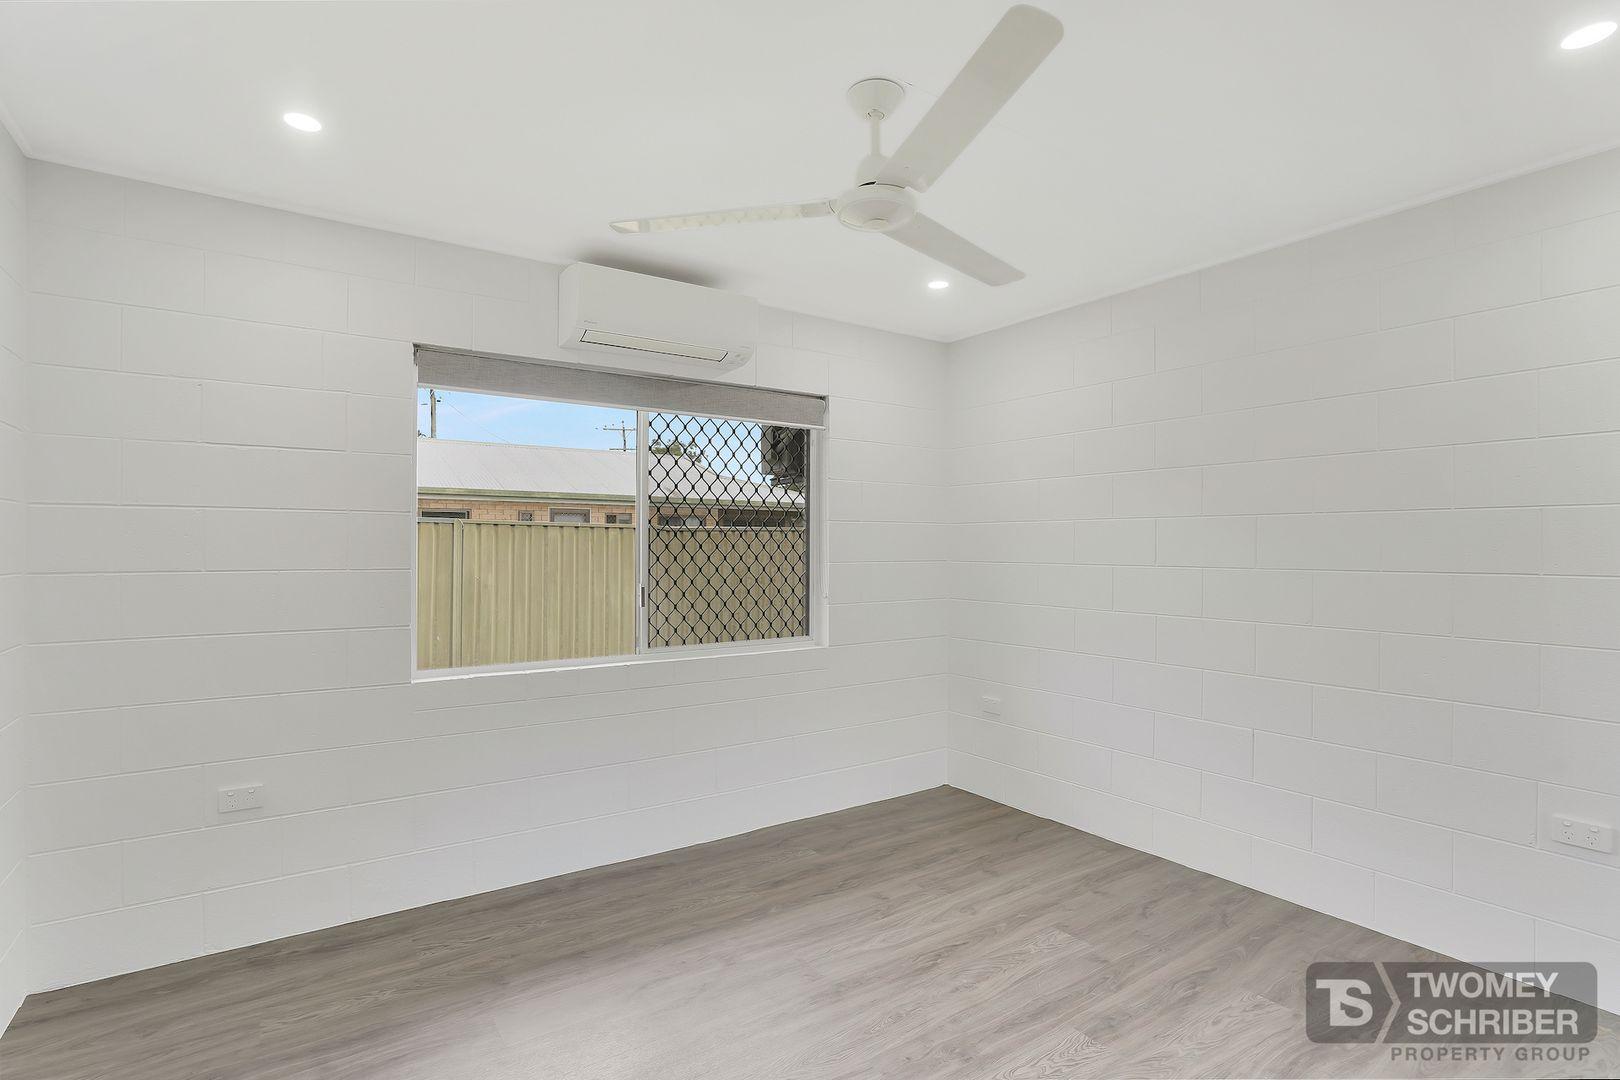 102-104 Dillon Street, Westcourt QLD 4870, Image 1